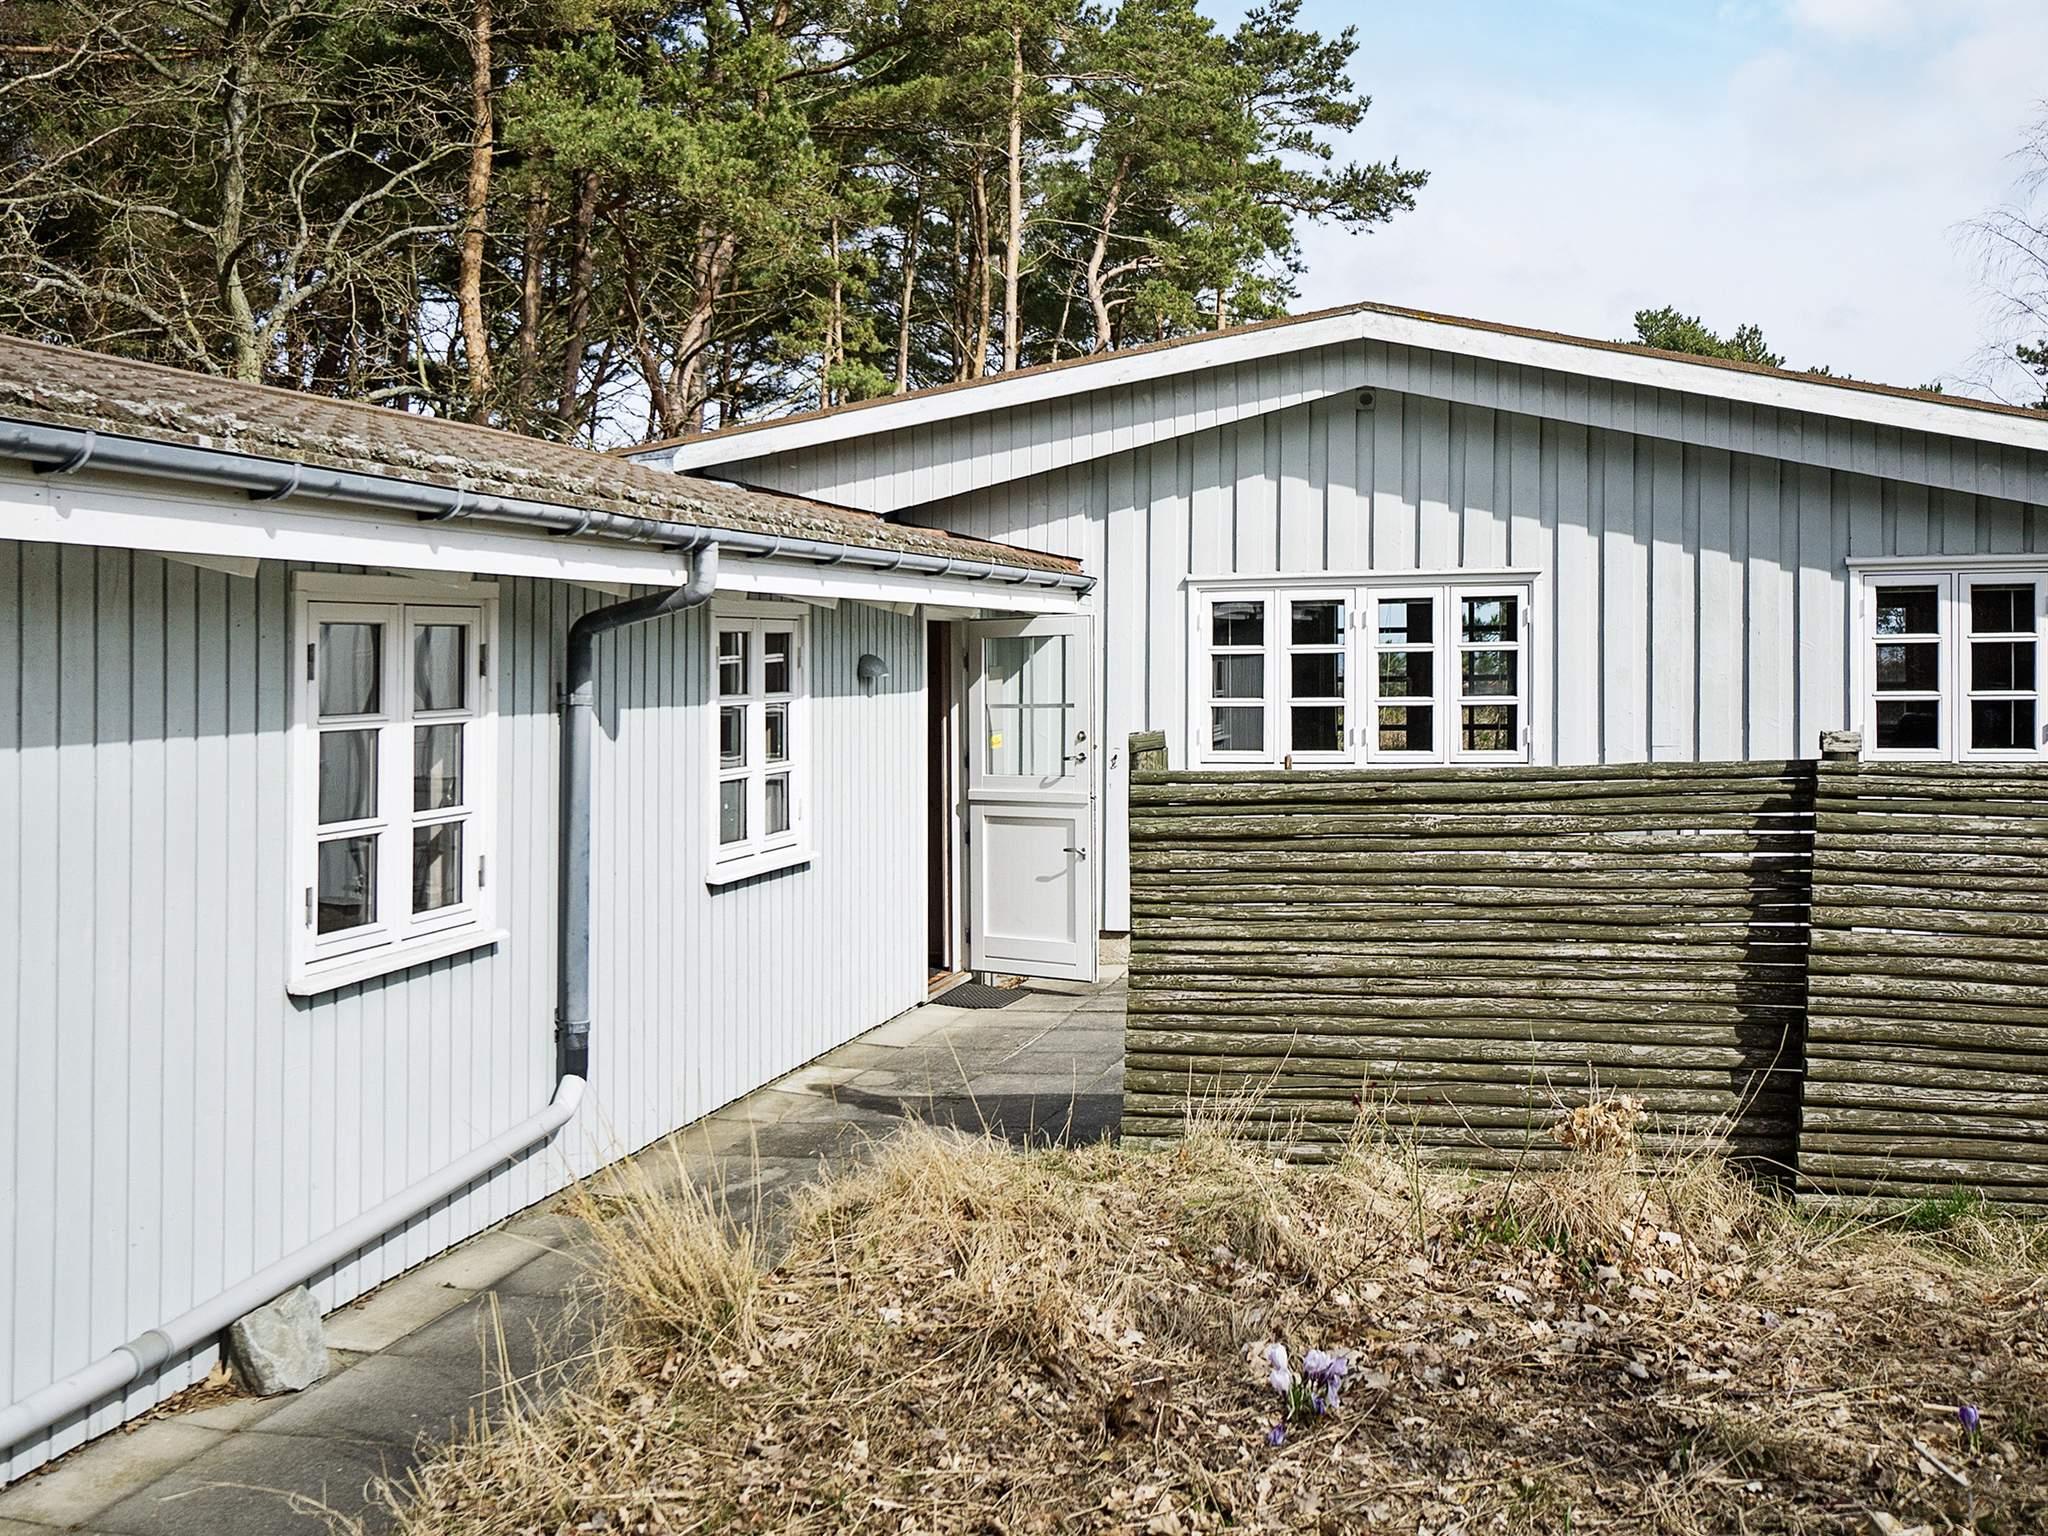 Ferienhaus Balka Strand (493388), Balke, , Bornholm, Dänemark, Bild 15